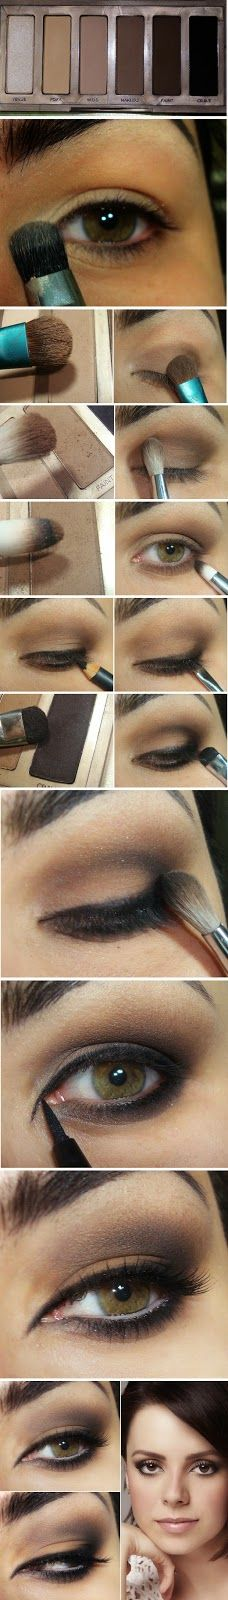 10 #Eyeliner Hacks Every Girl Should Know #Eyes #EyesCare #Beautytips #Beauty #makeup